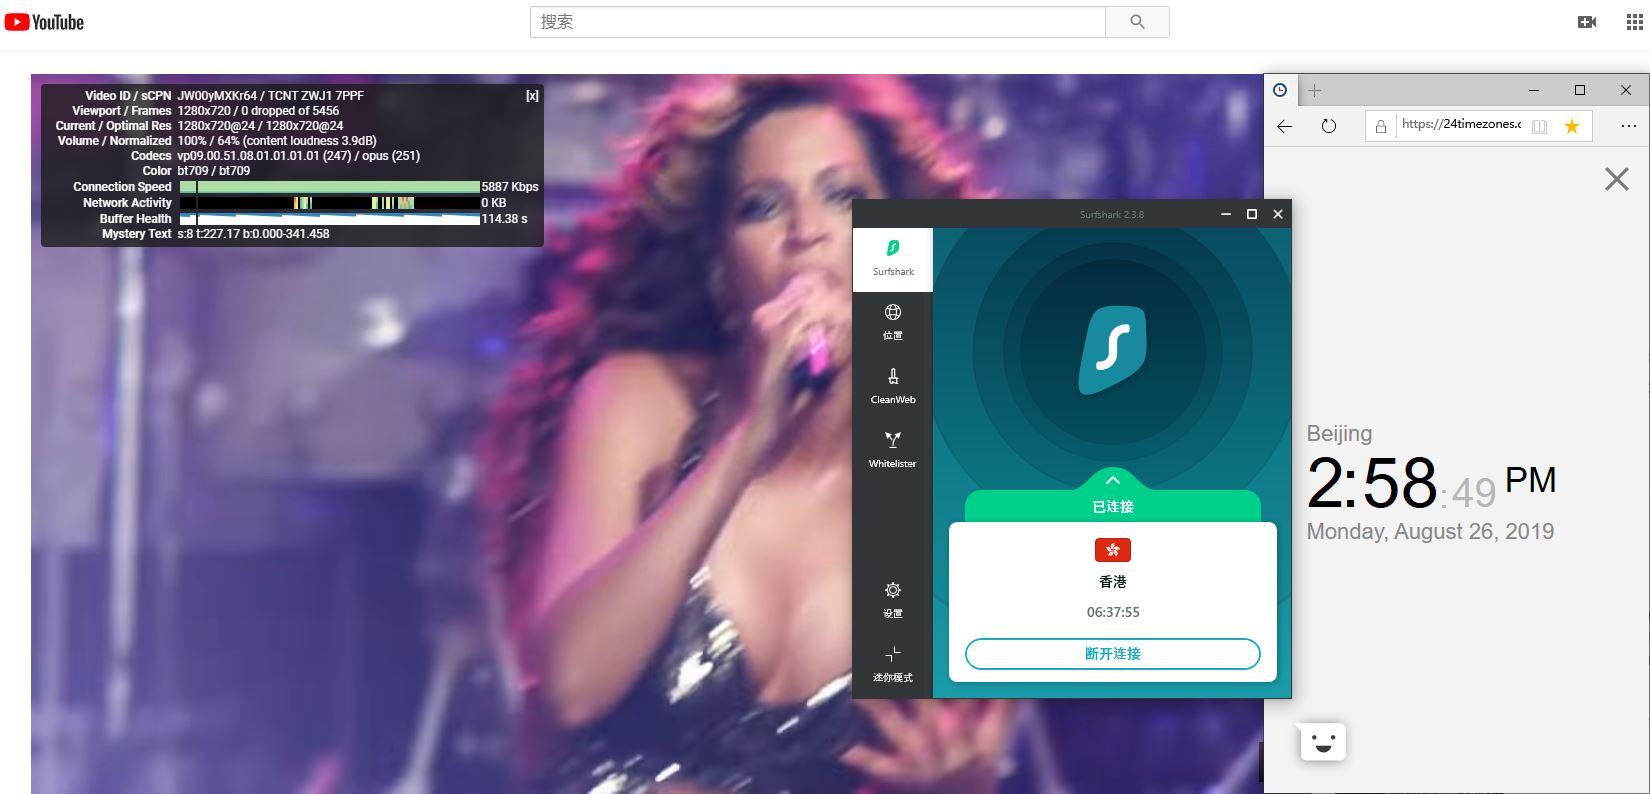 surfshark vpn windows 香港服务器 中国翻墙 科学上网 YouTube速度测试-20190826